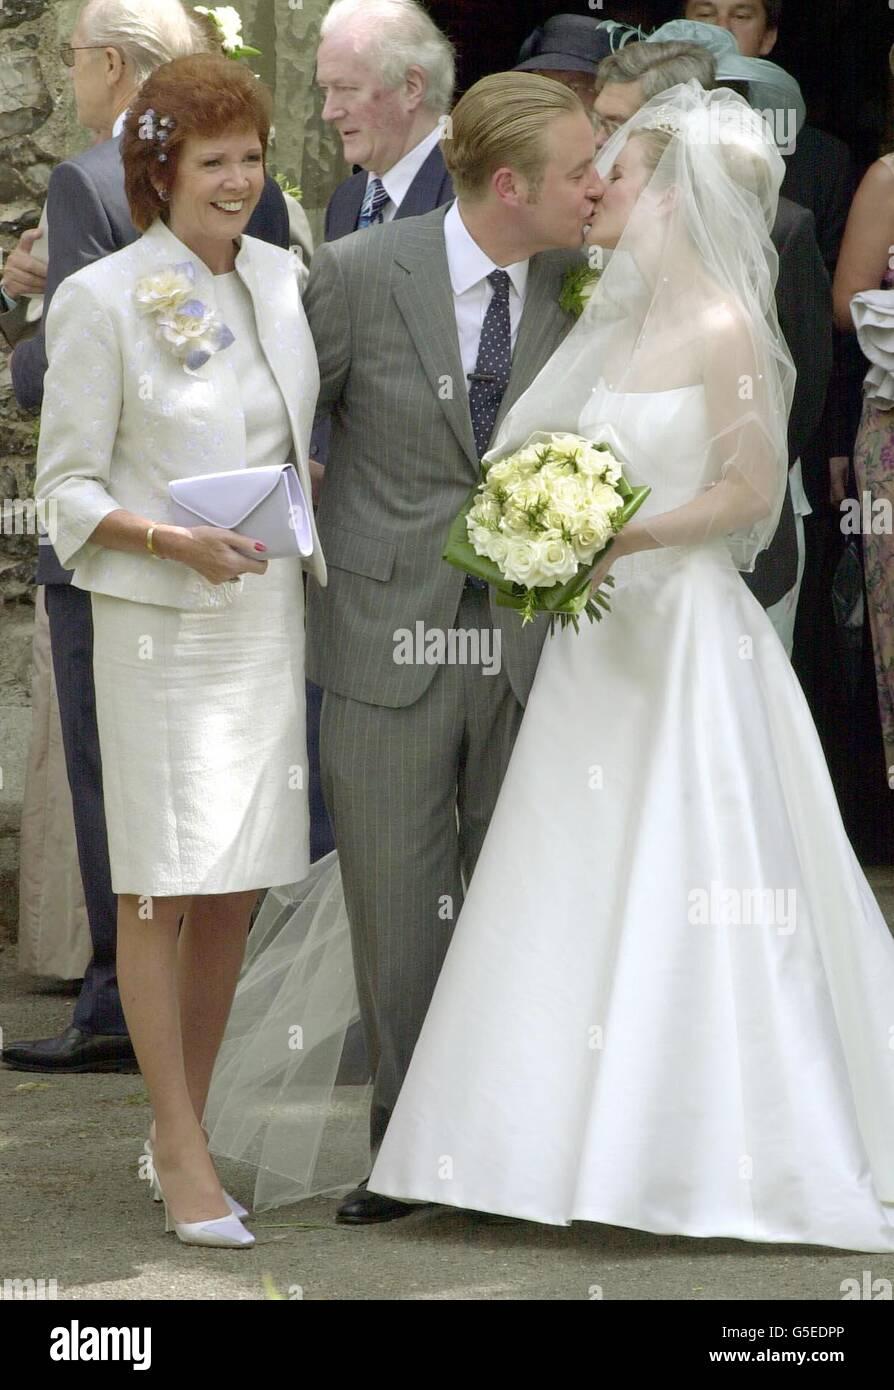 Cilla black wedding dresses